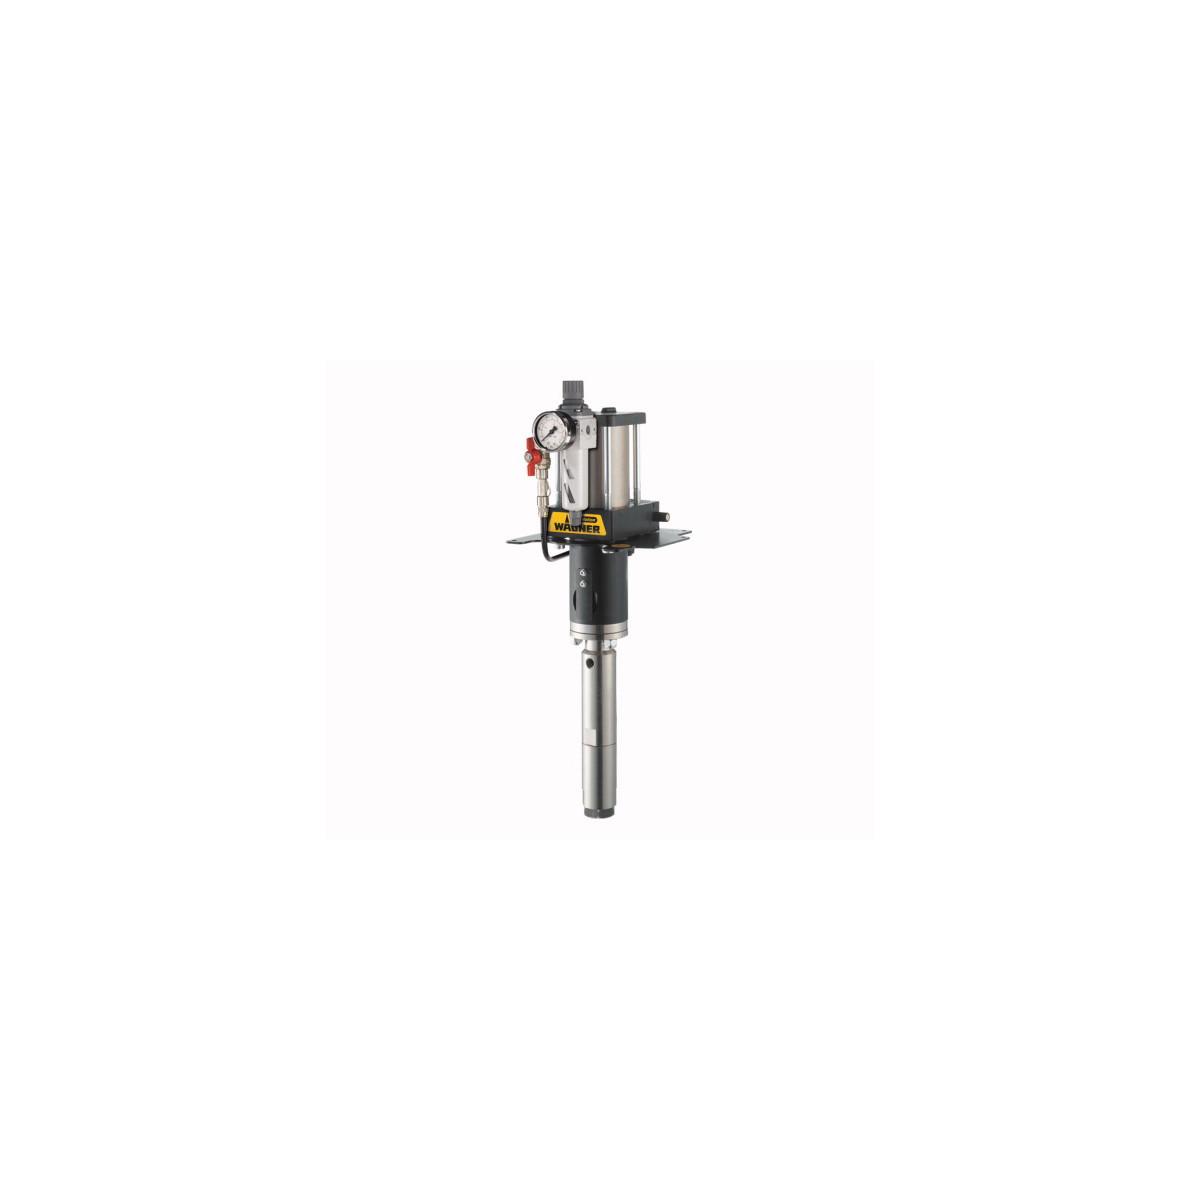 High Pressure Piston Pump : Wagner evomotion s high pressure piston pump